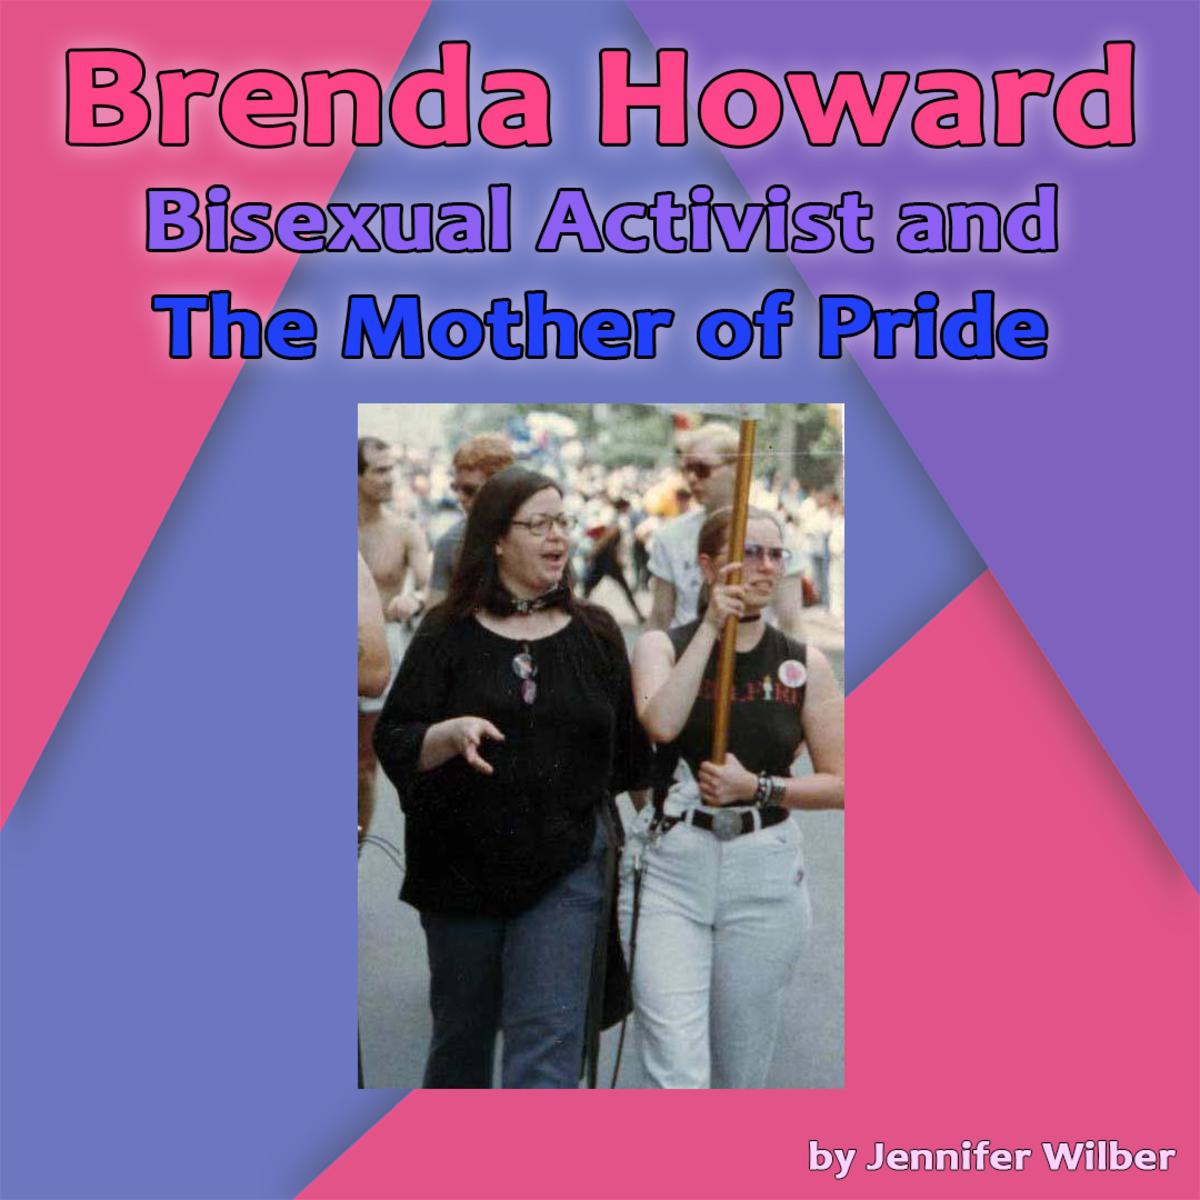 Brenda Howard: Bi Activist, Mother of Pride